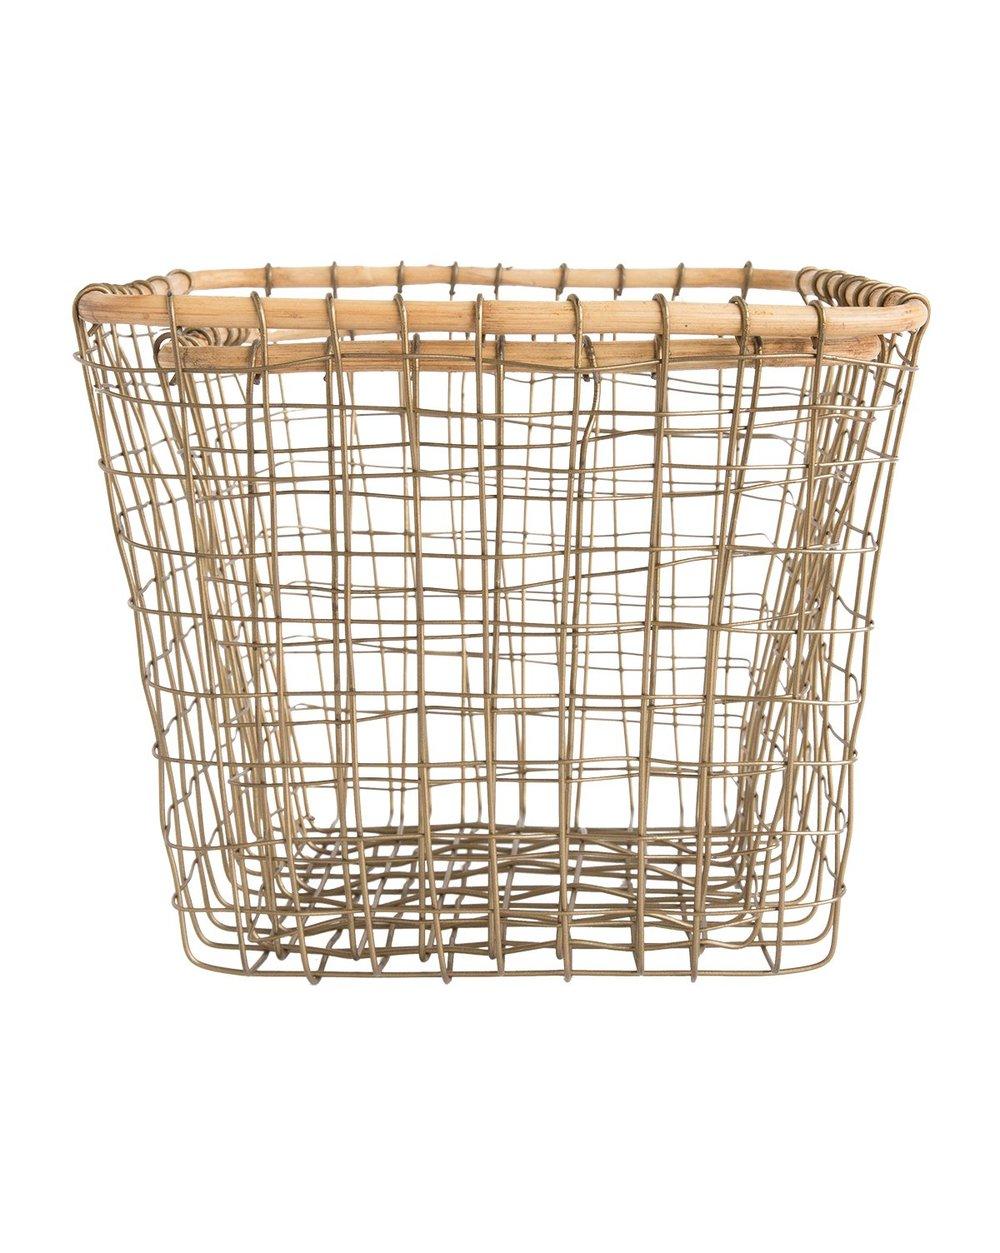 Square_Wire_Baskets_2.jpg